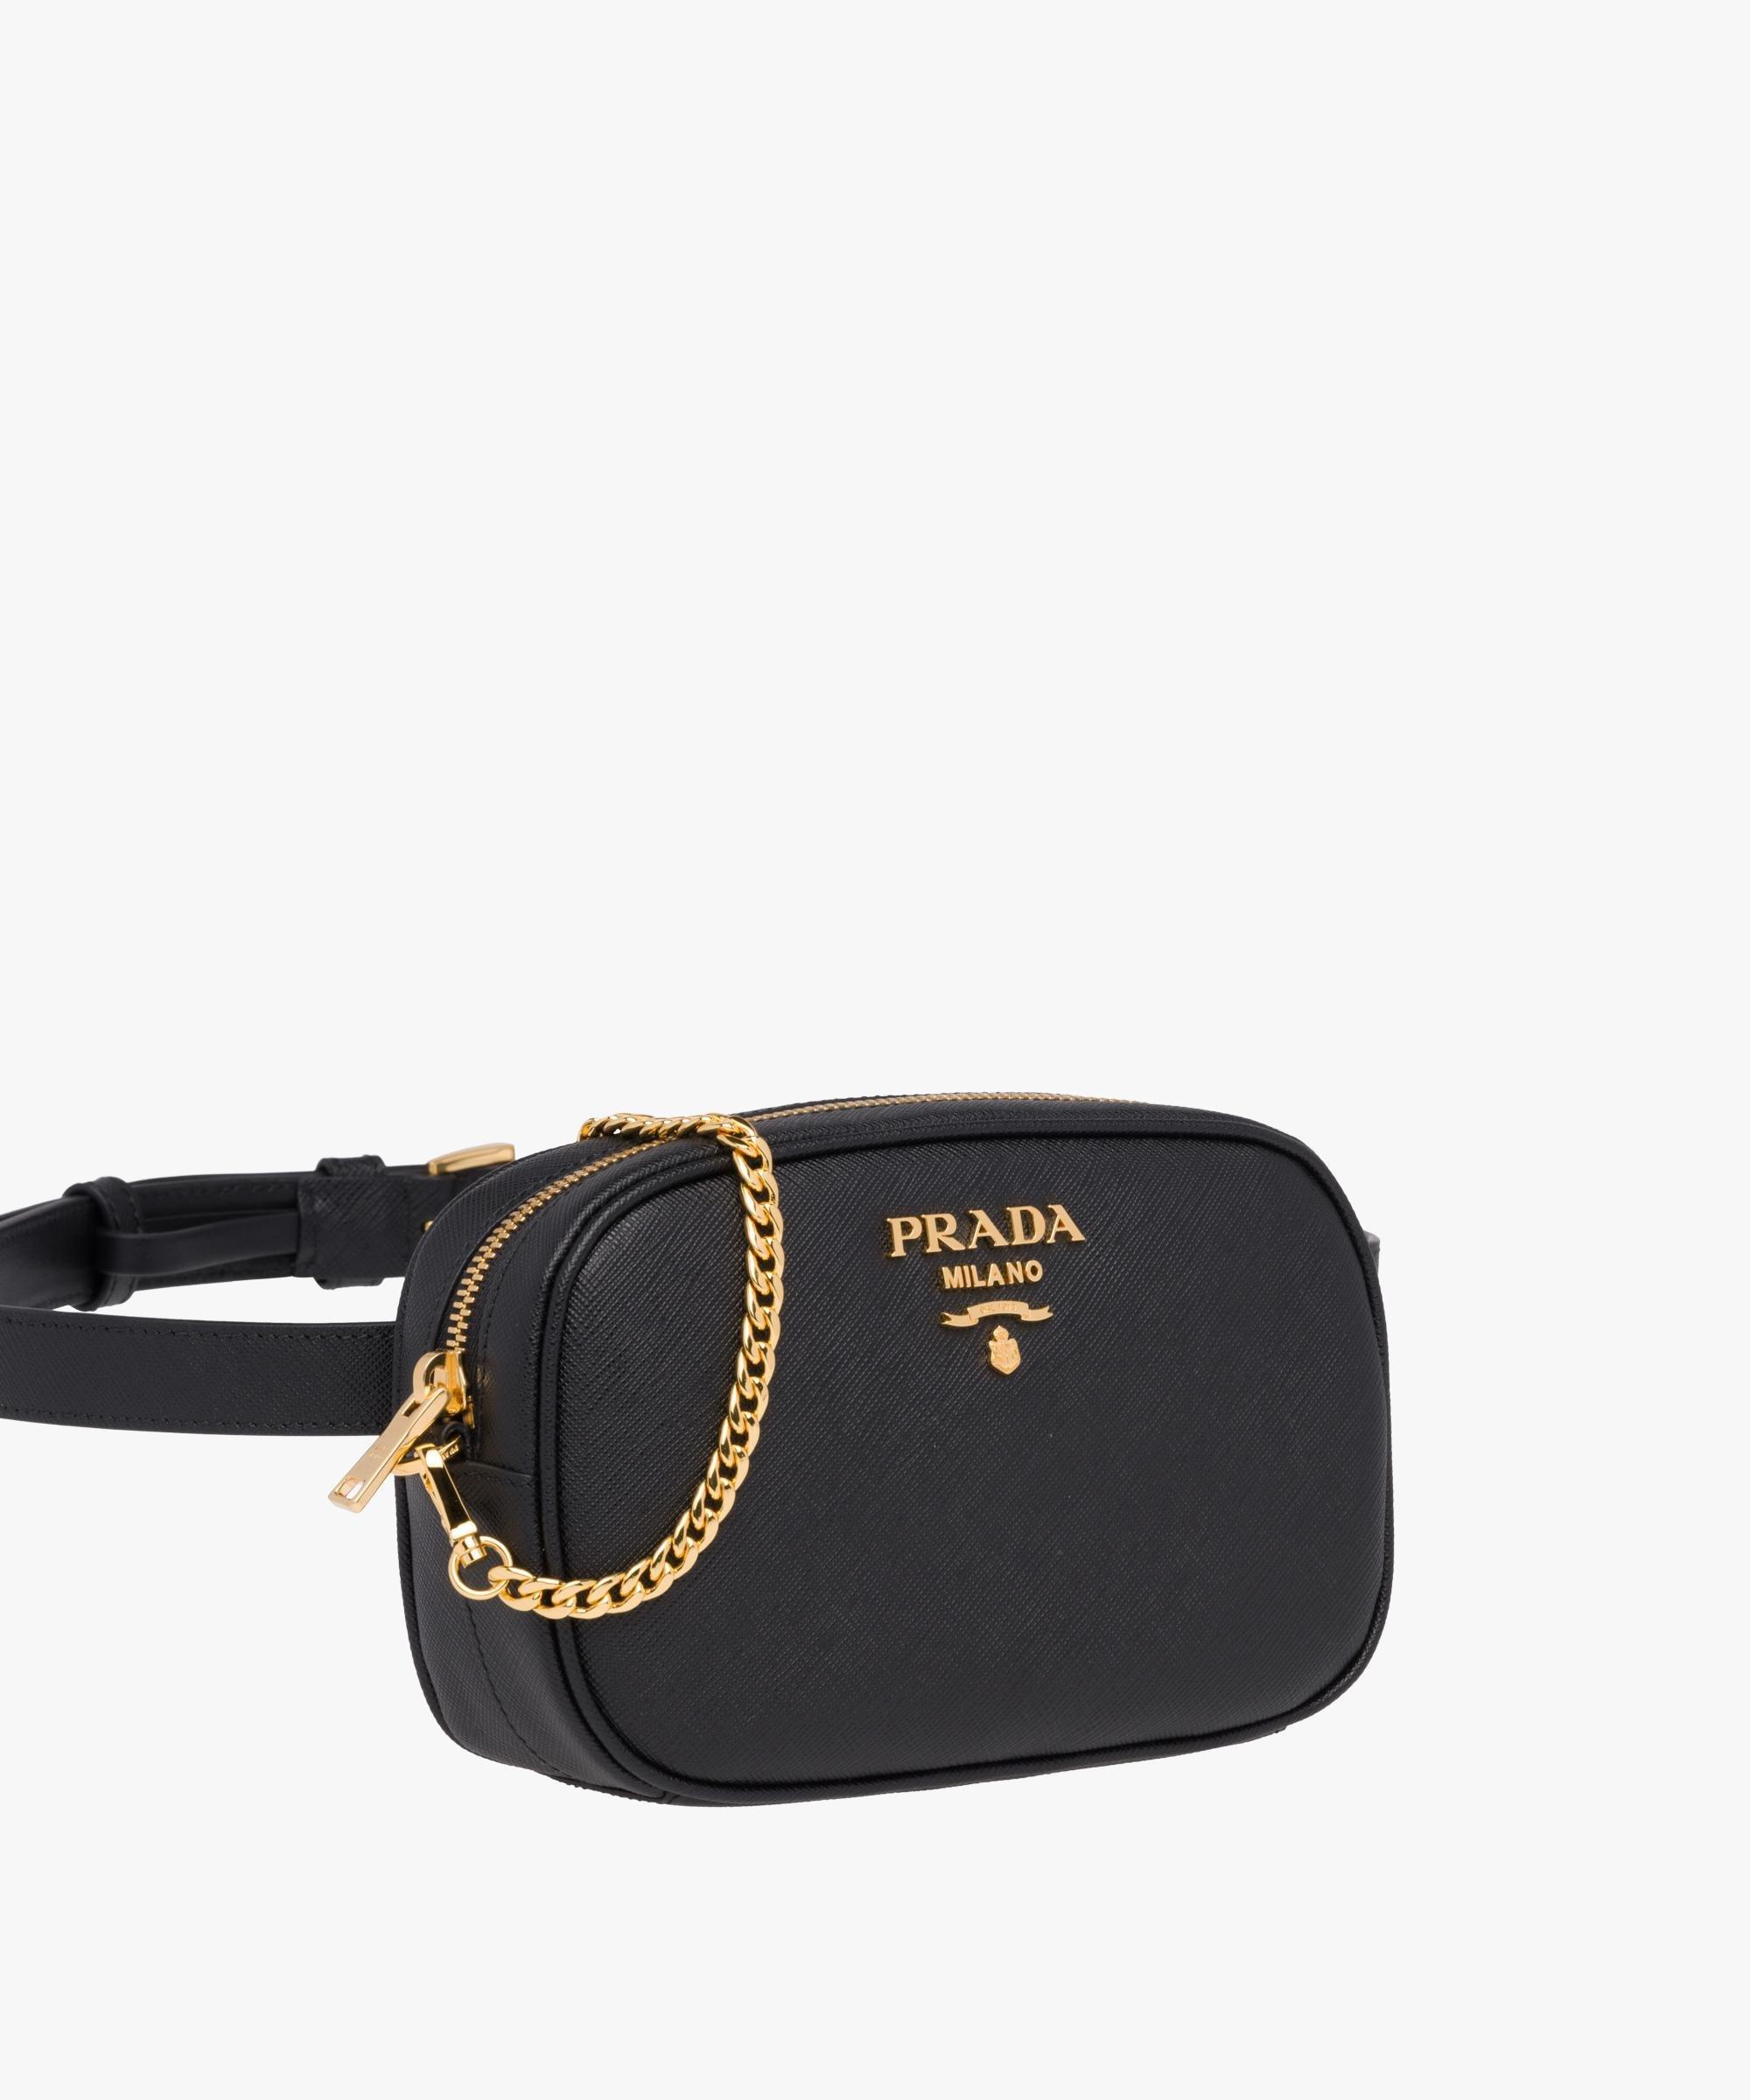 36e61b75c28fbf Prada Saffiano Leather Belt Bag in Black - Lyst